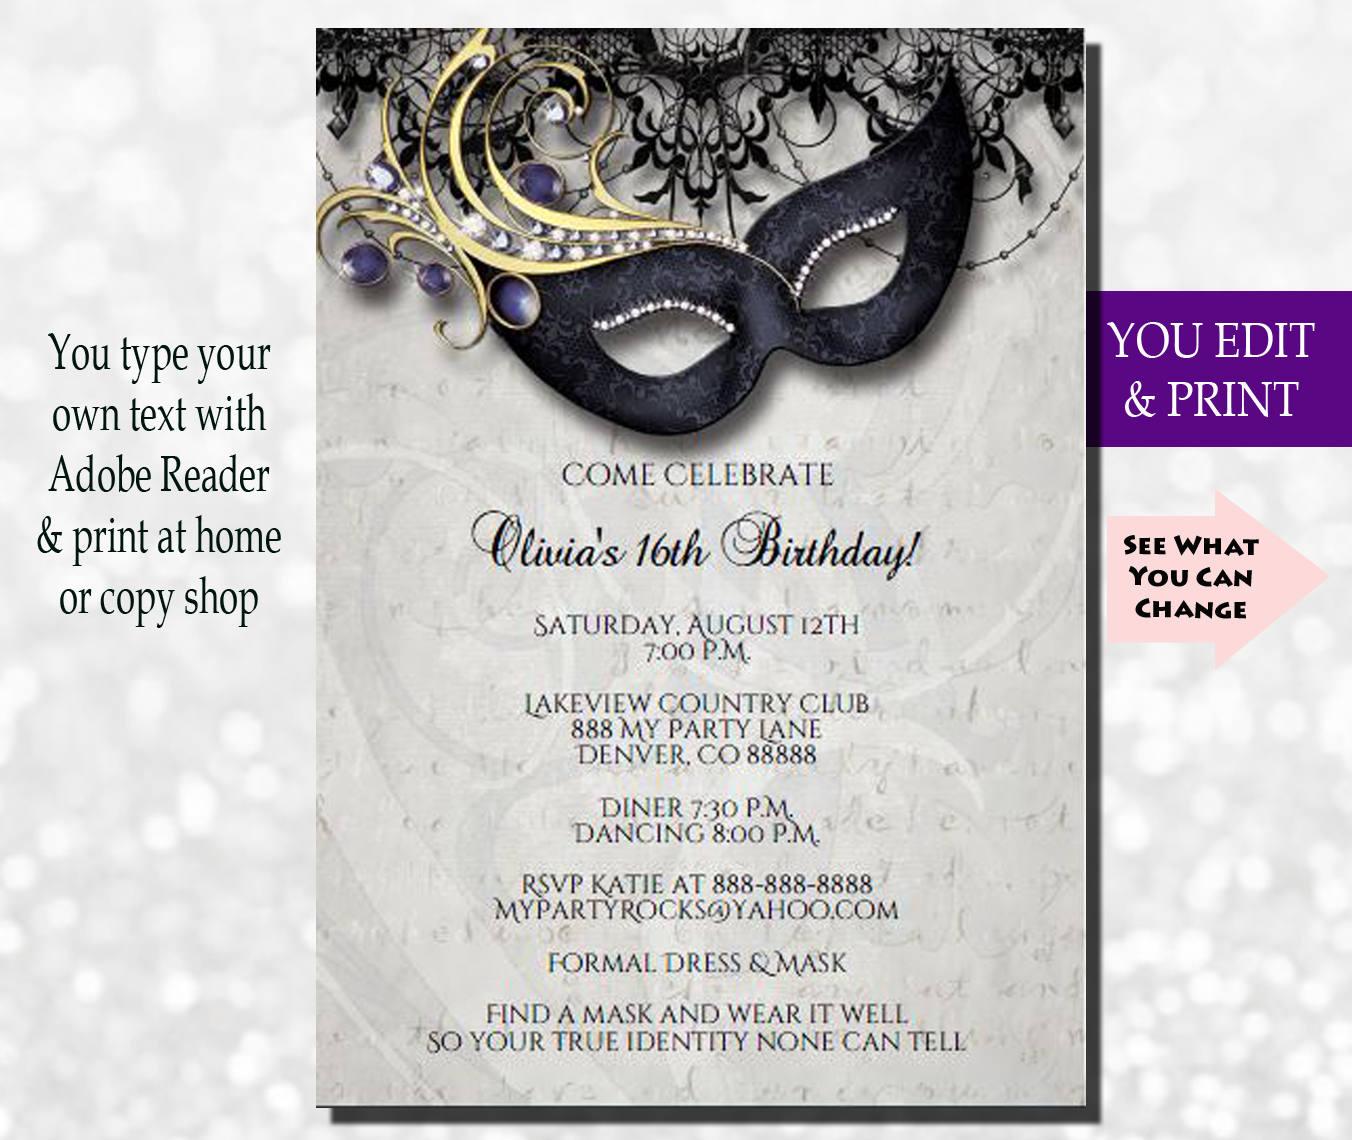 Masquerade Invitation Masquerade Party Invitation Masquerade | Etsy